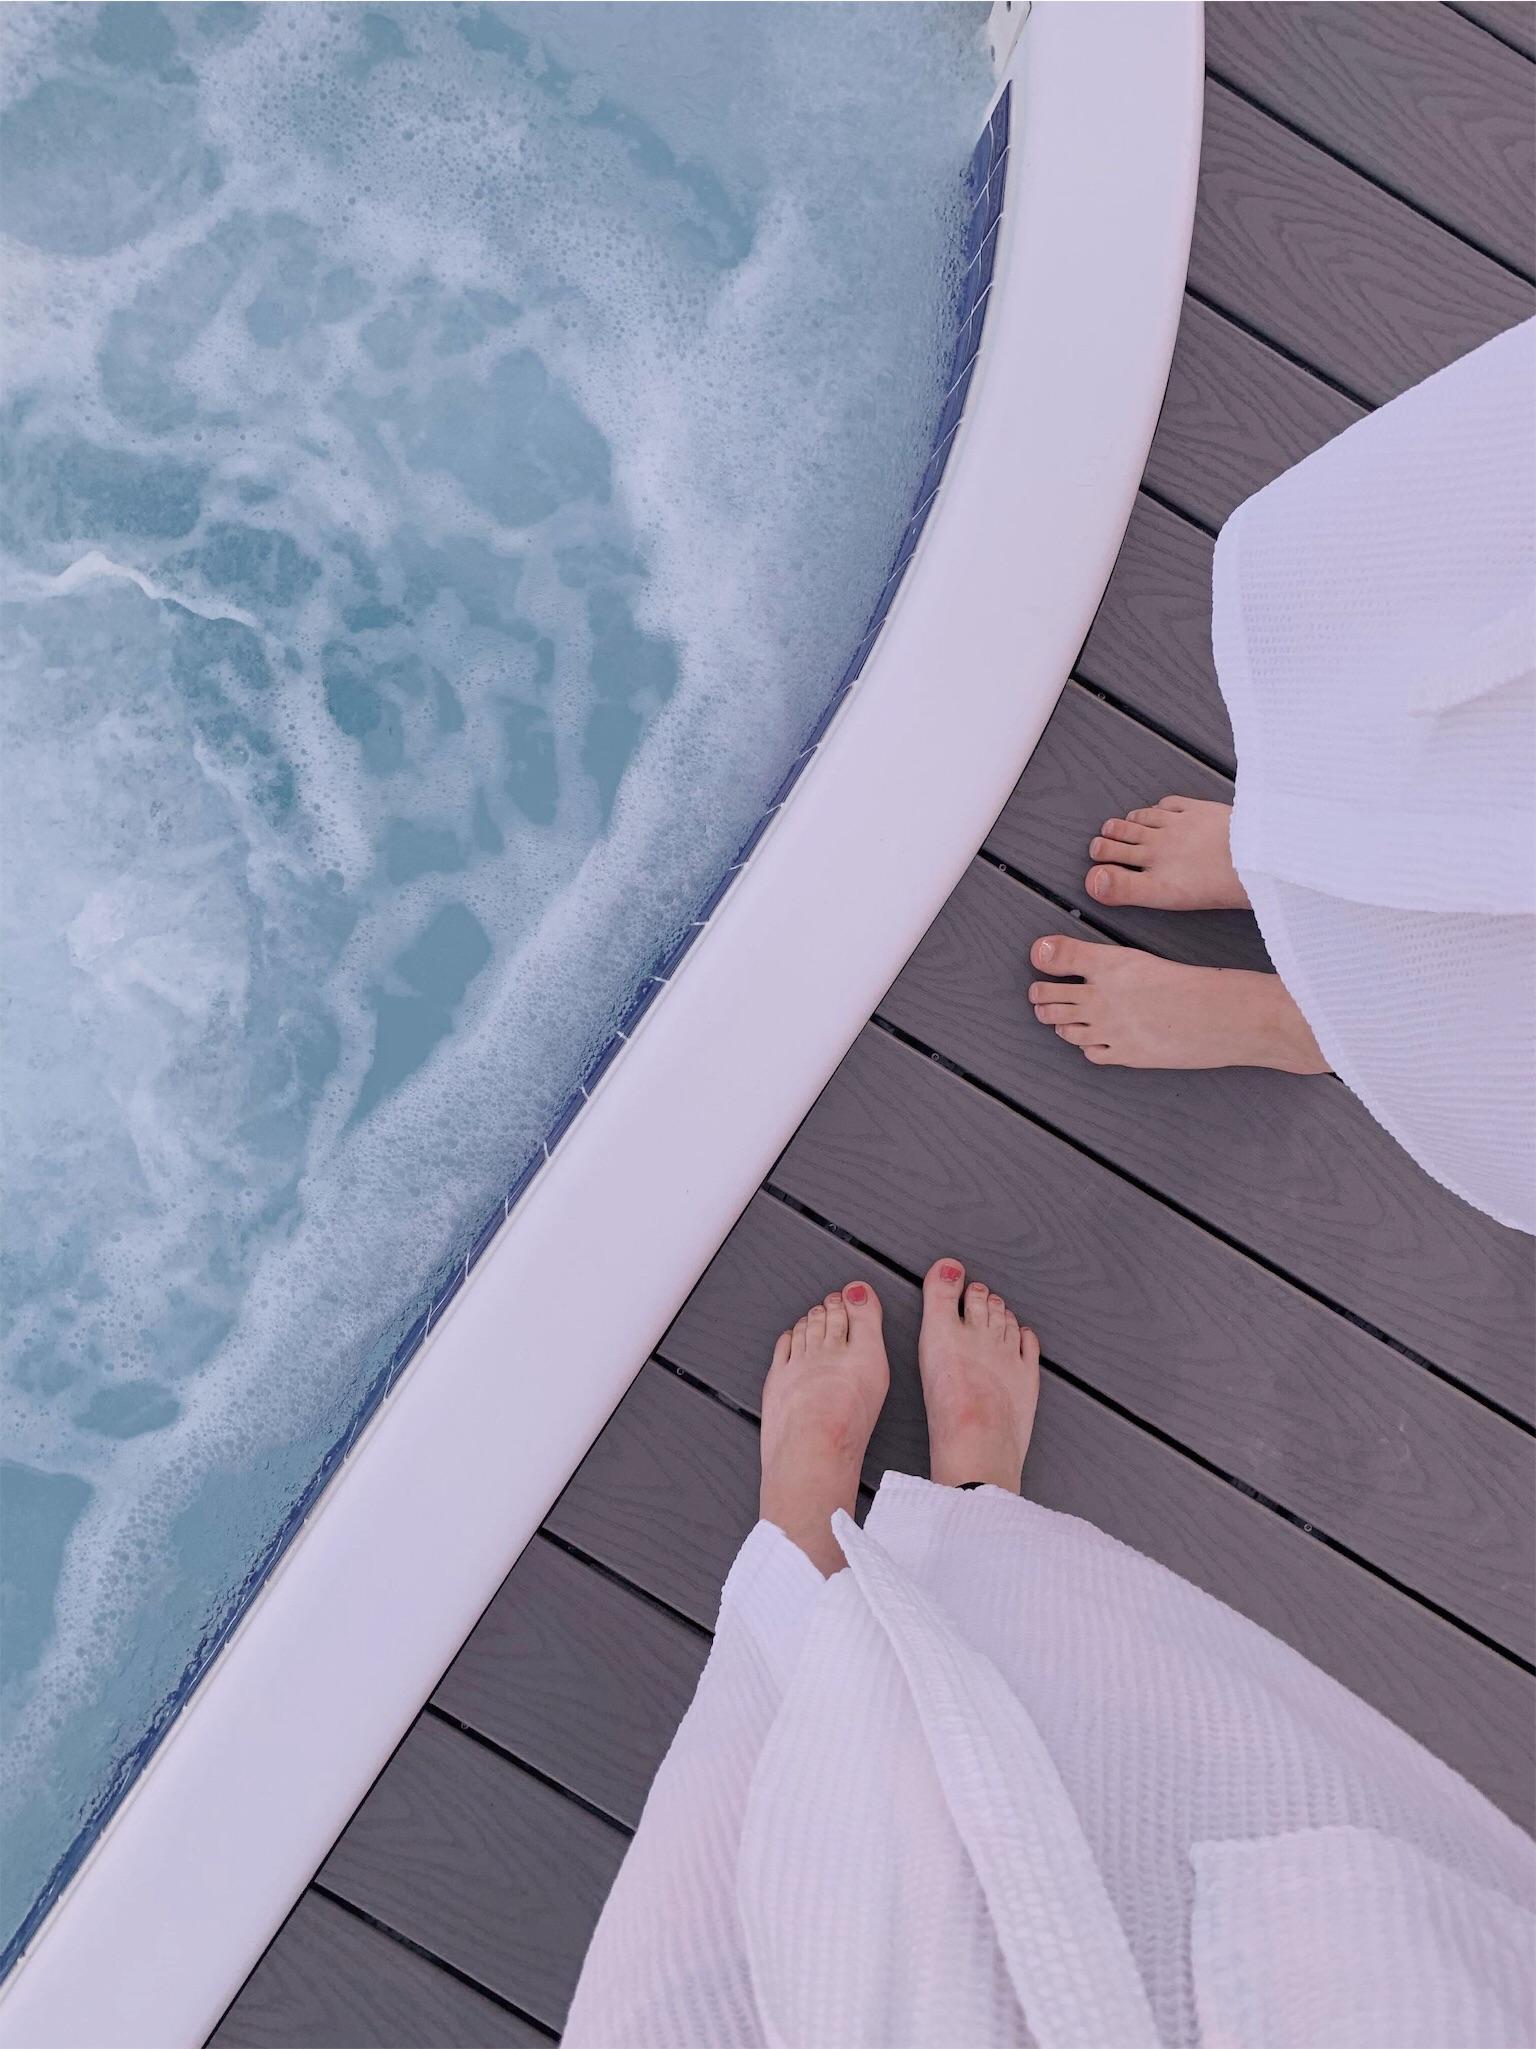 hotel-clique-hot-tub.jpg